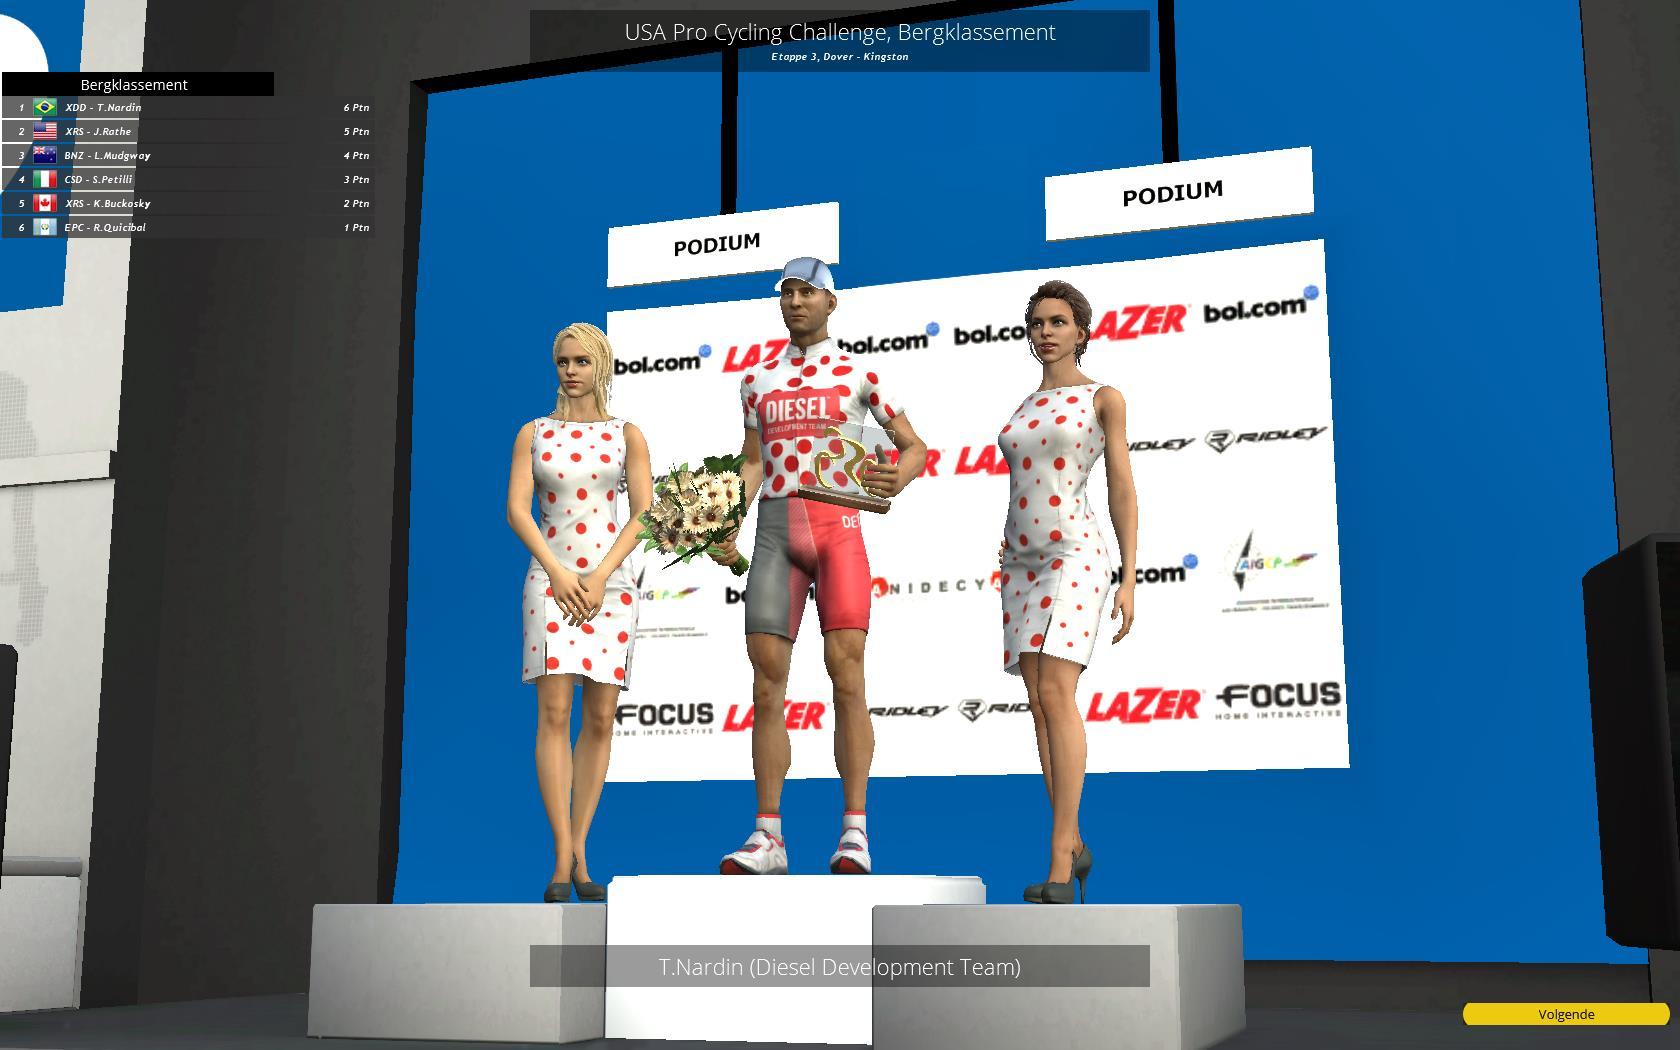 pcmdaily.com/images/mg/2018/Races/C2/USAPCC/3/PCM0016.jpg